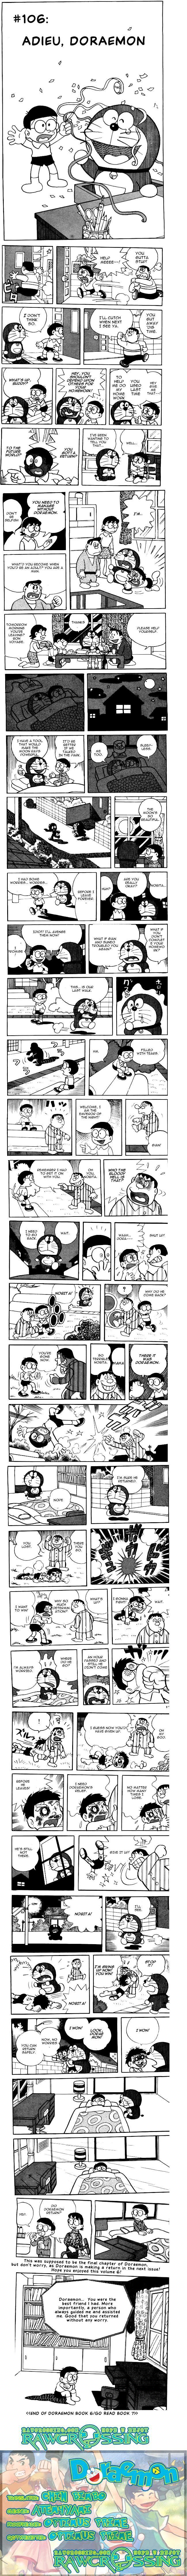 Doraemon 106 Page 1